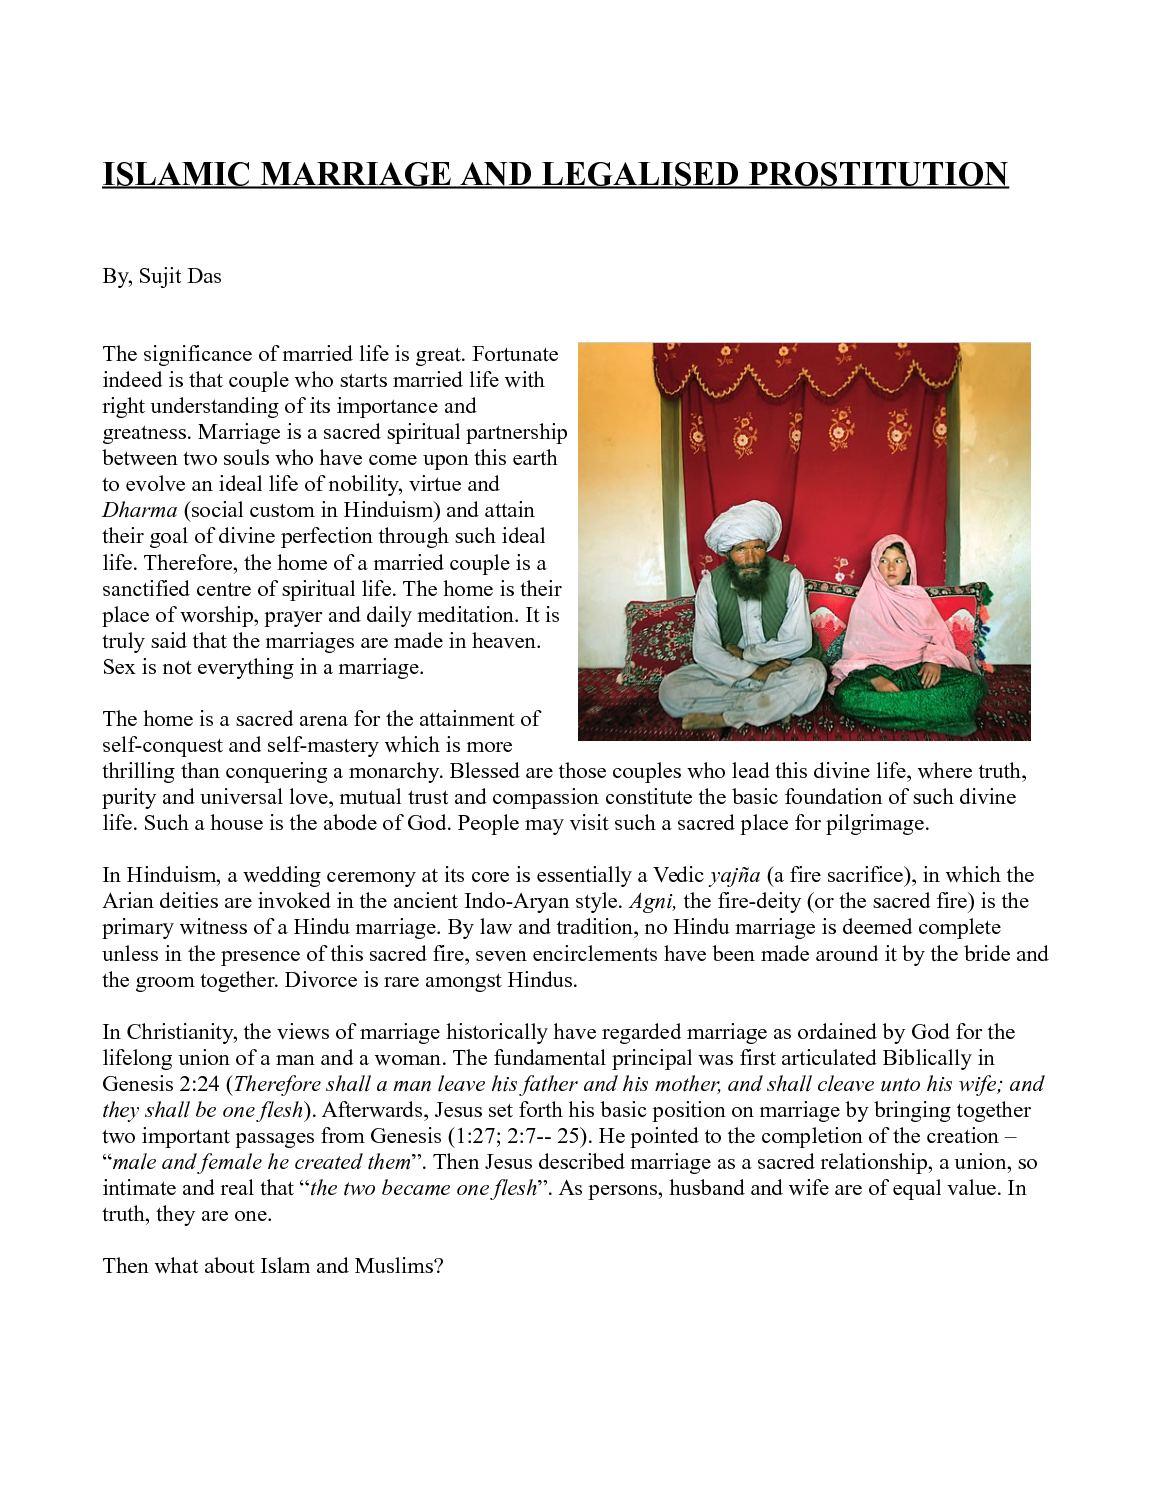 Usa in mutah marriage en.sigmacasa.com